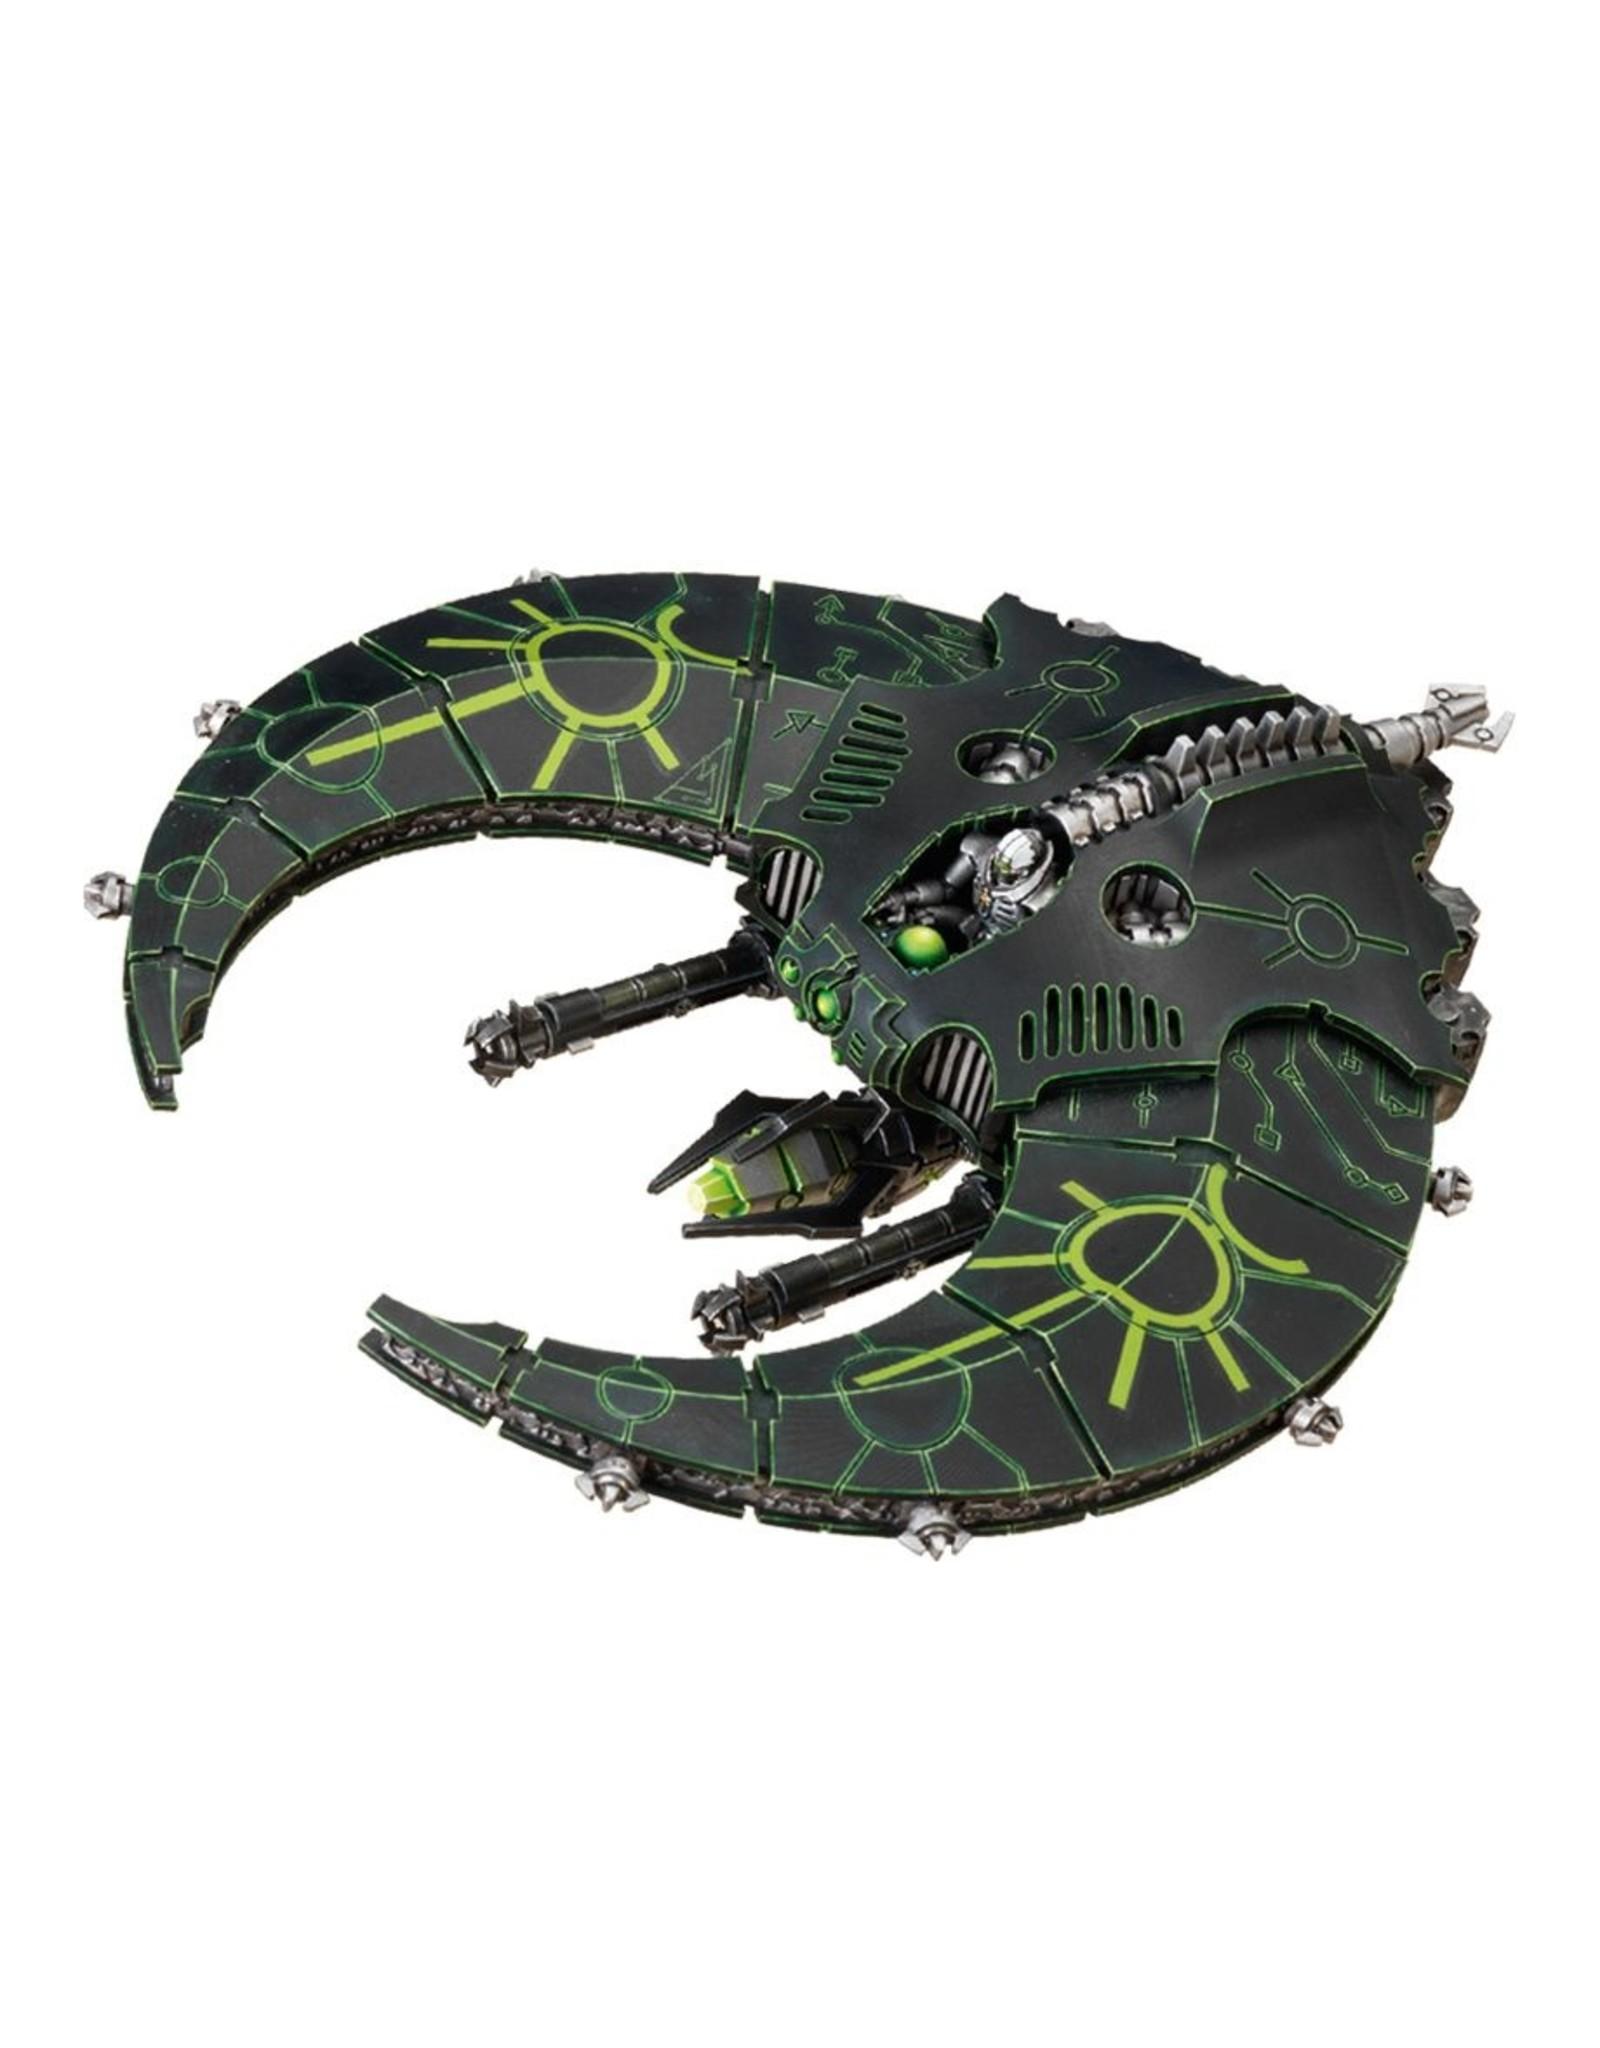 Games Workshop Necrons: Night Scythe/Doom Scythe